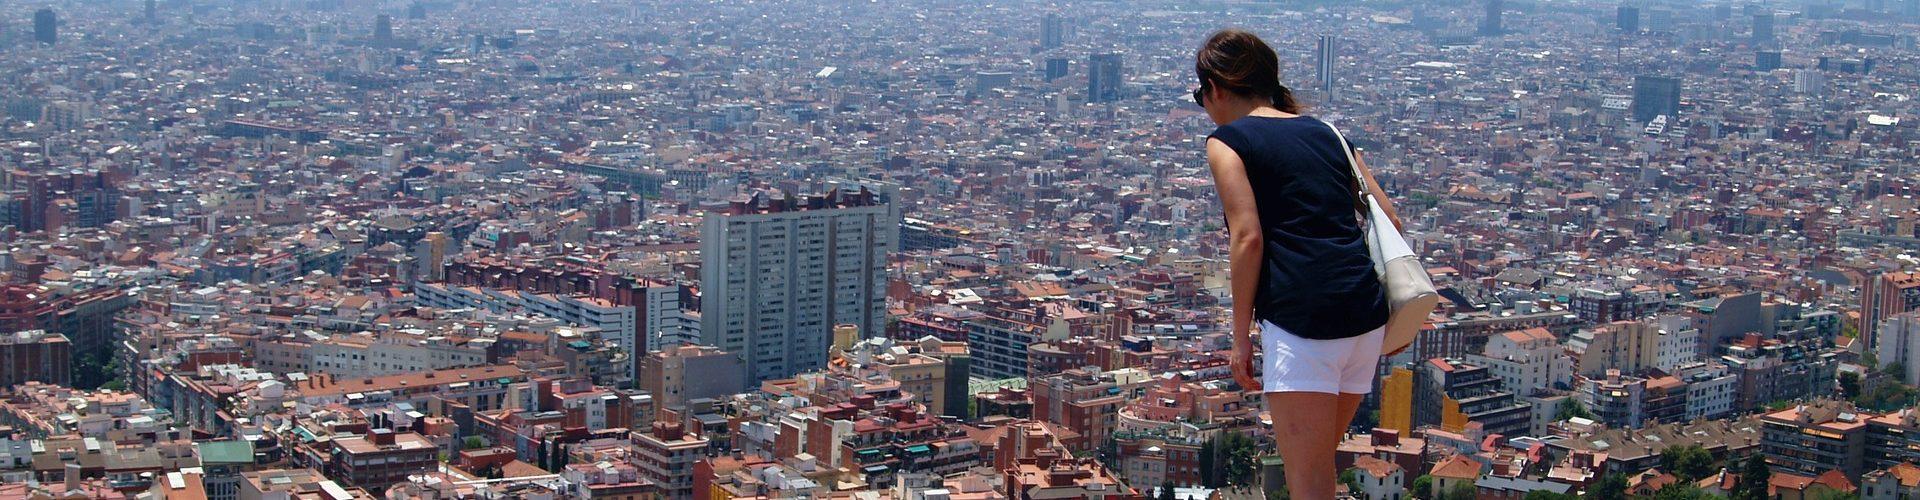 barcelona-1535198_1920